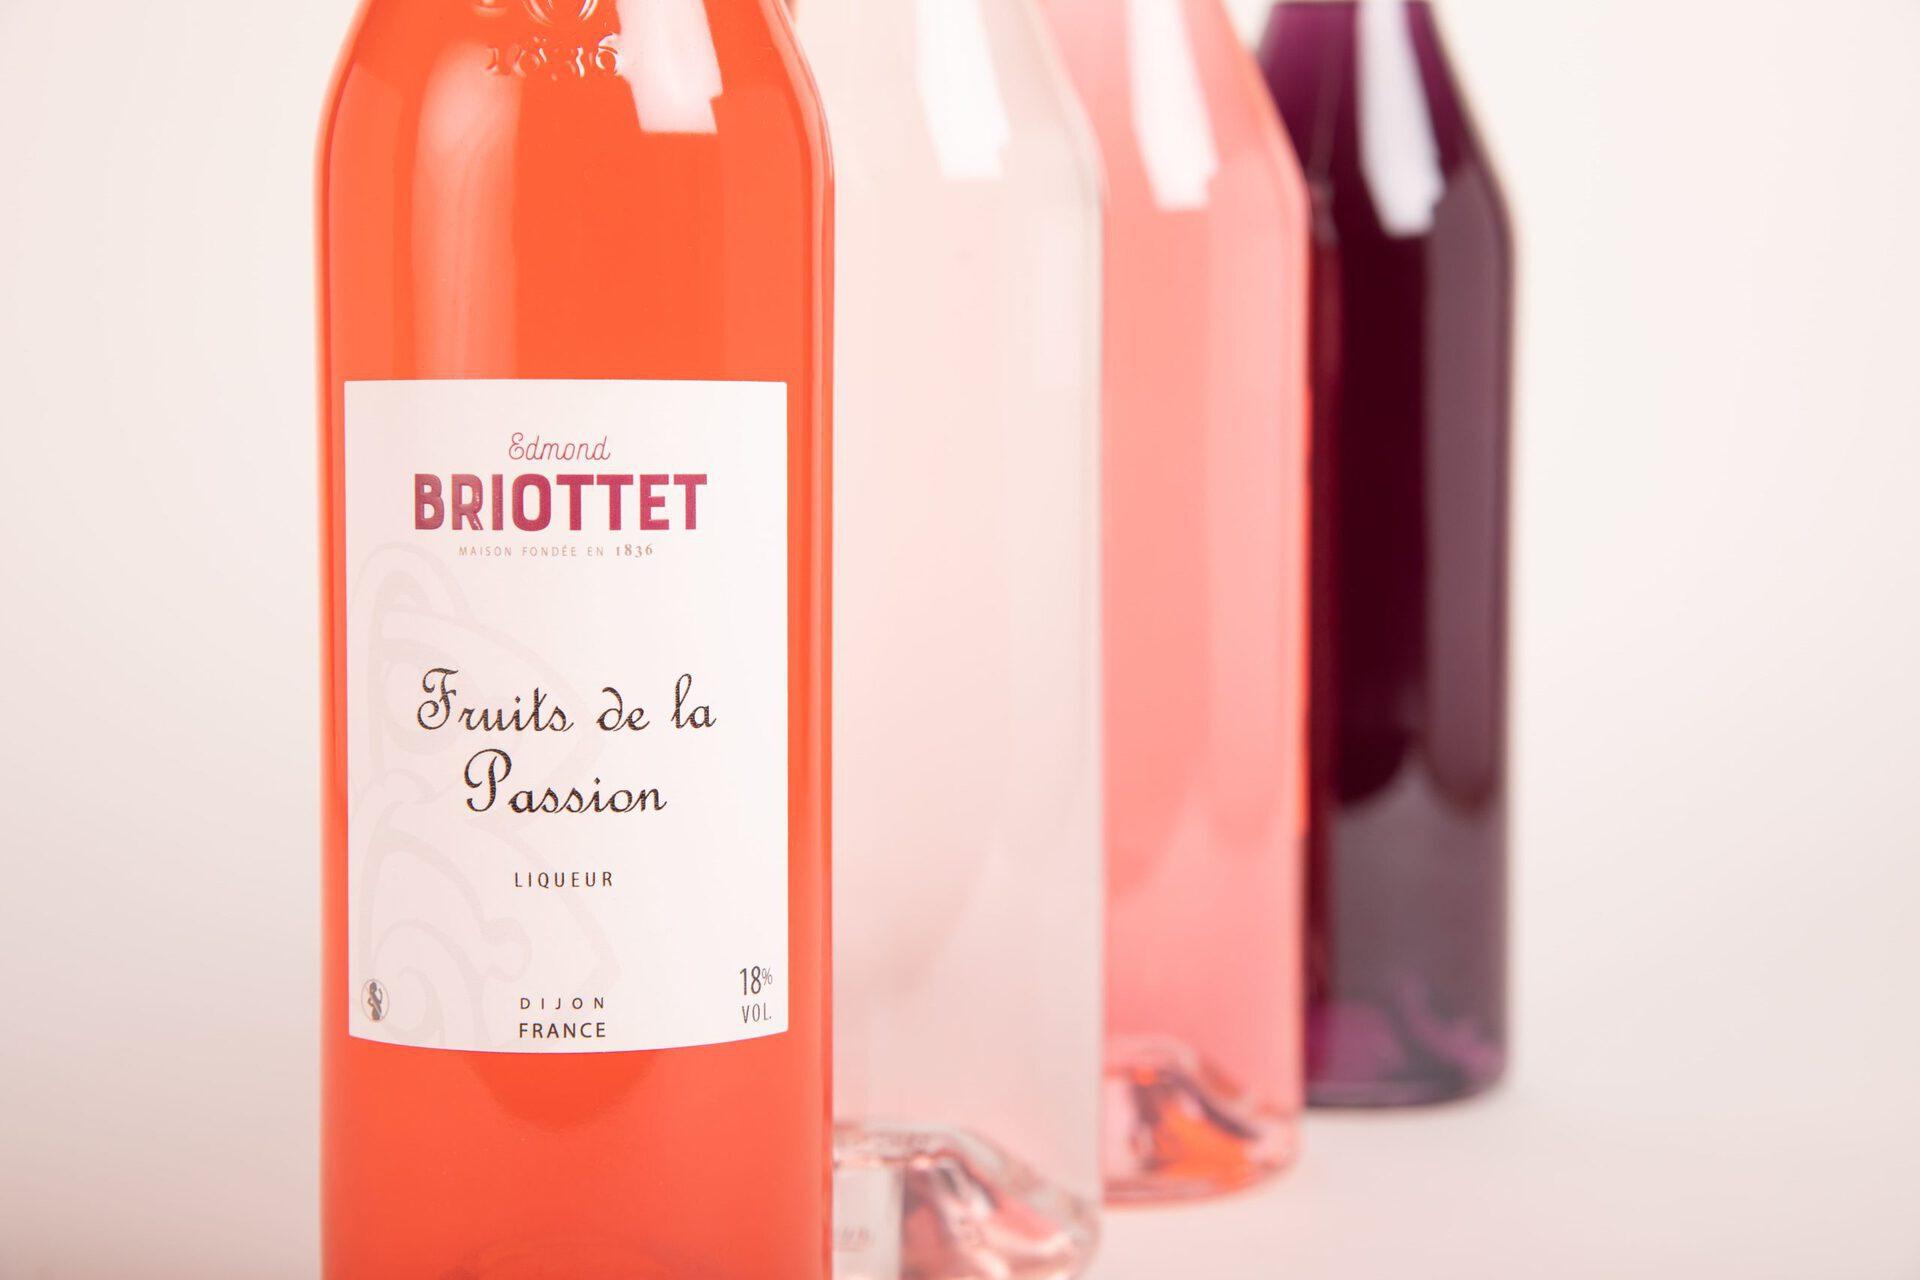 1-Briottet 2018 10 PINK - Antoine Martel - Photographe